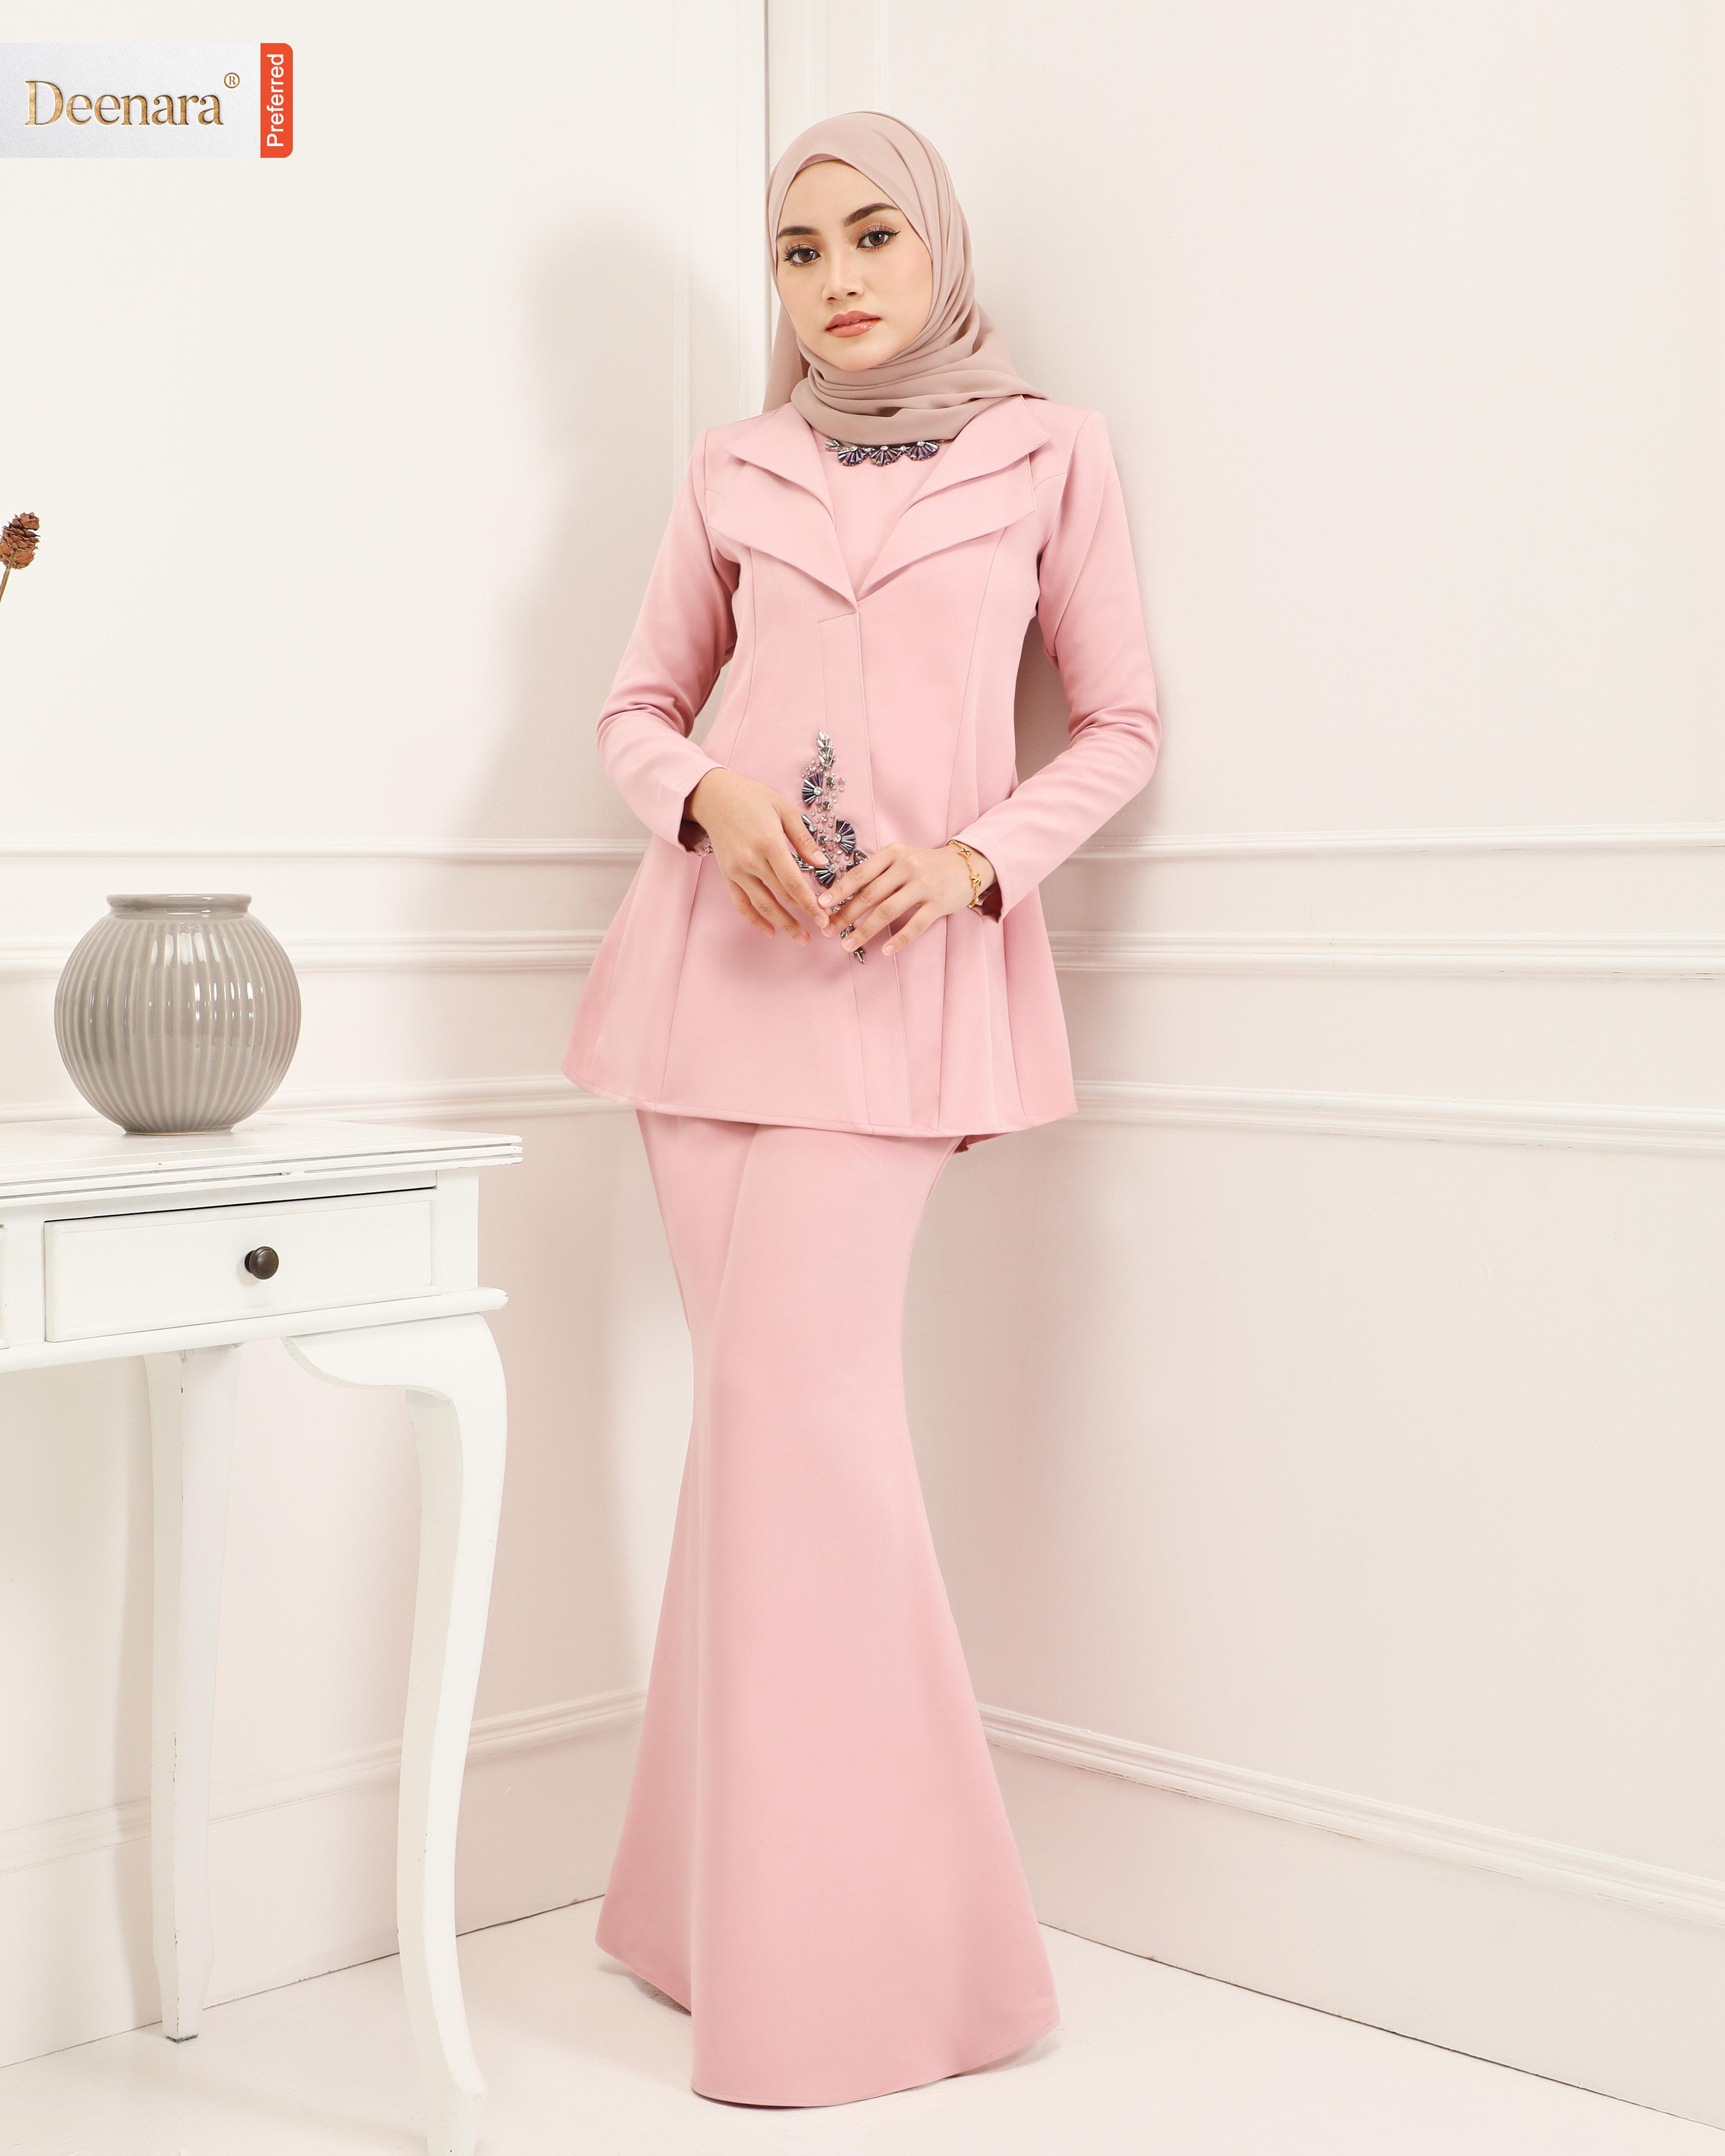 Roseanna - Lemonade Pink